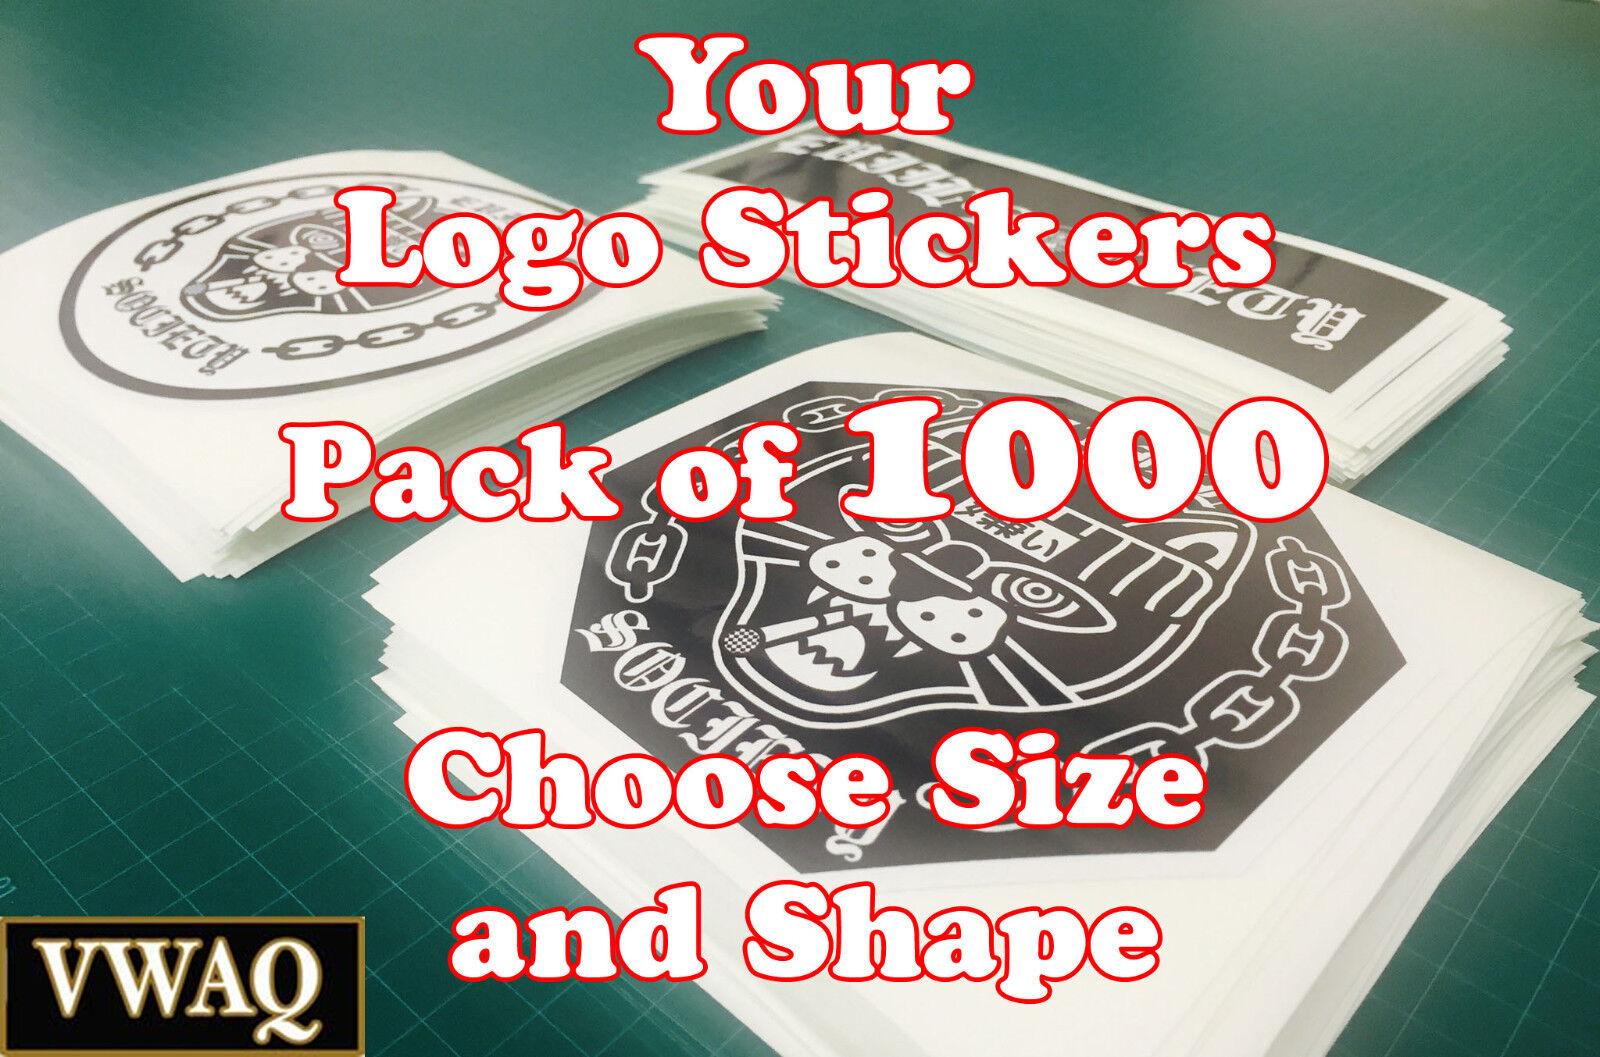 Custom Logo Stickers Big Pack 1000 Stickers Your Logo Design Vinyl Prints VWAQ